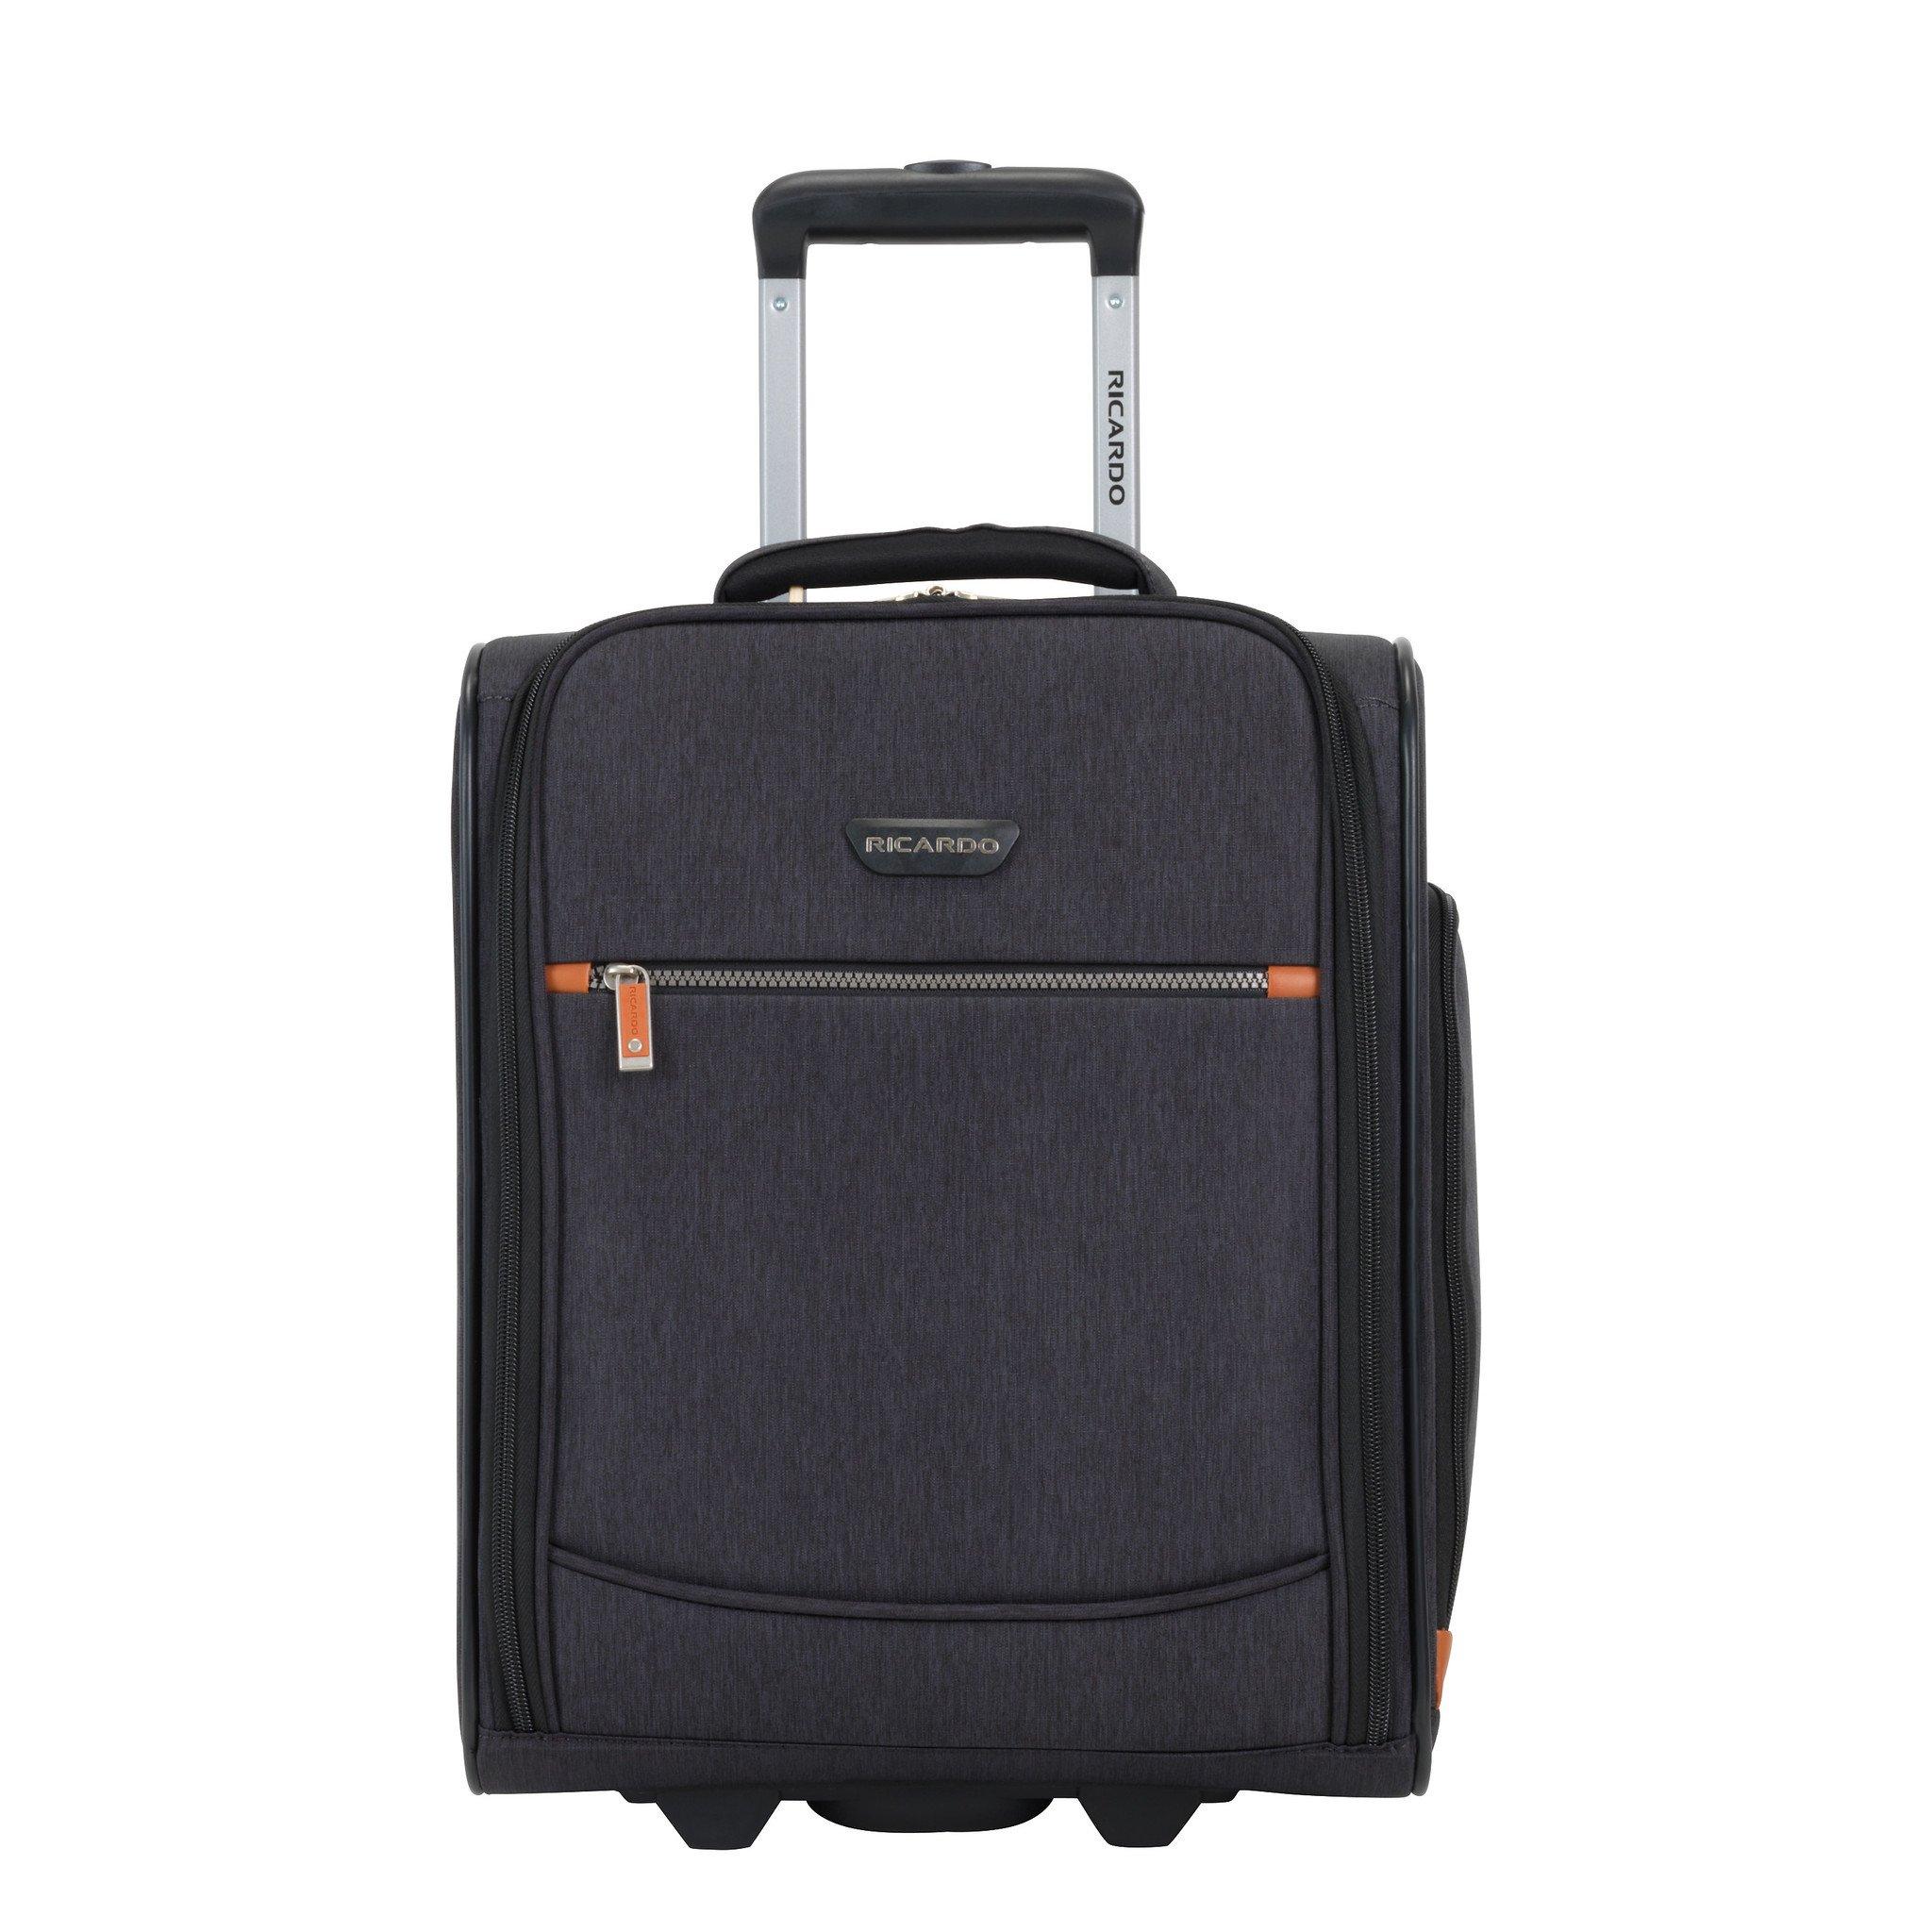 Ricardo Beverly Hills Luggage Shasta Lake 16'' Rolling Tote, Dark Charcoal